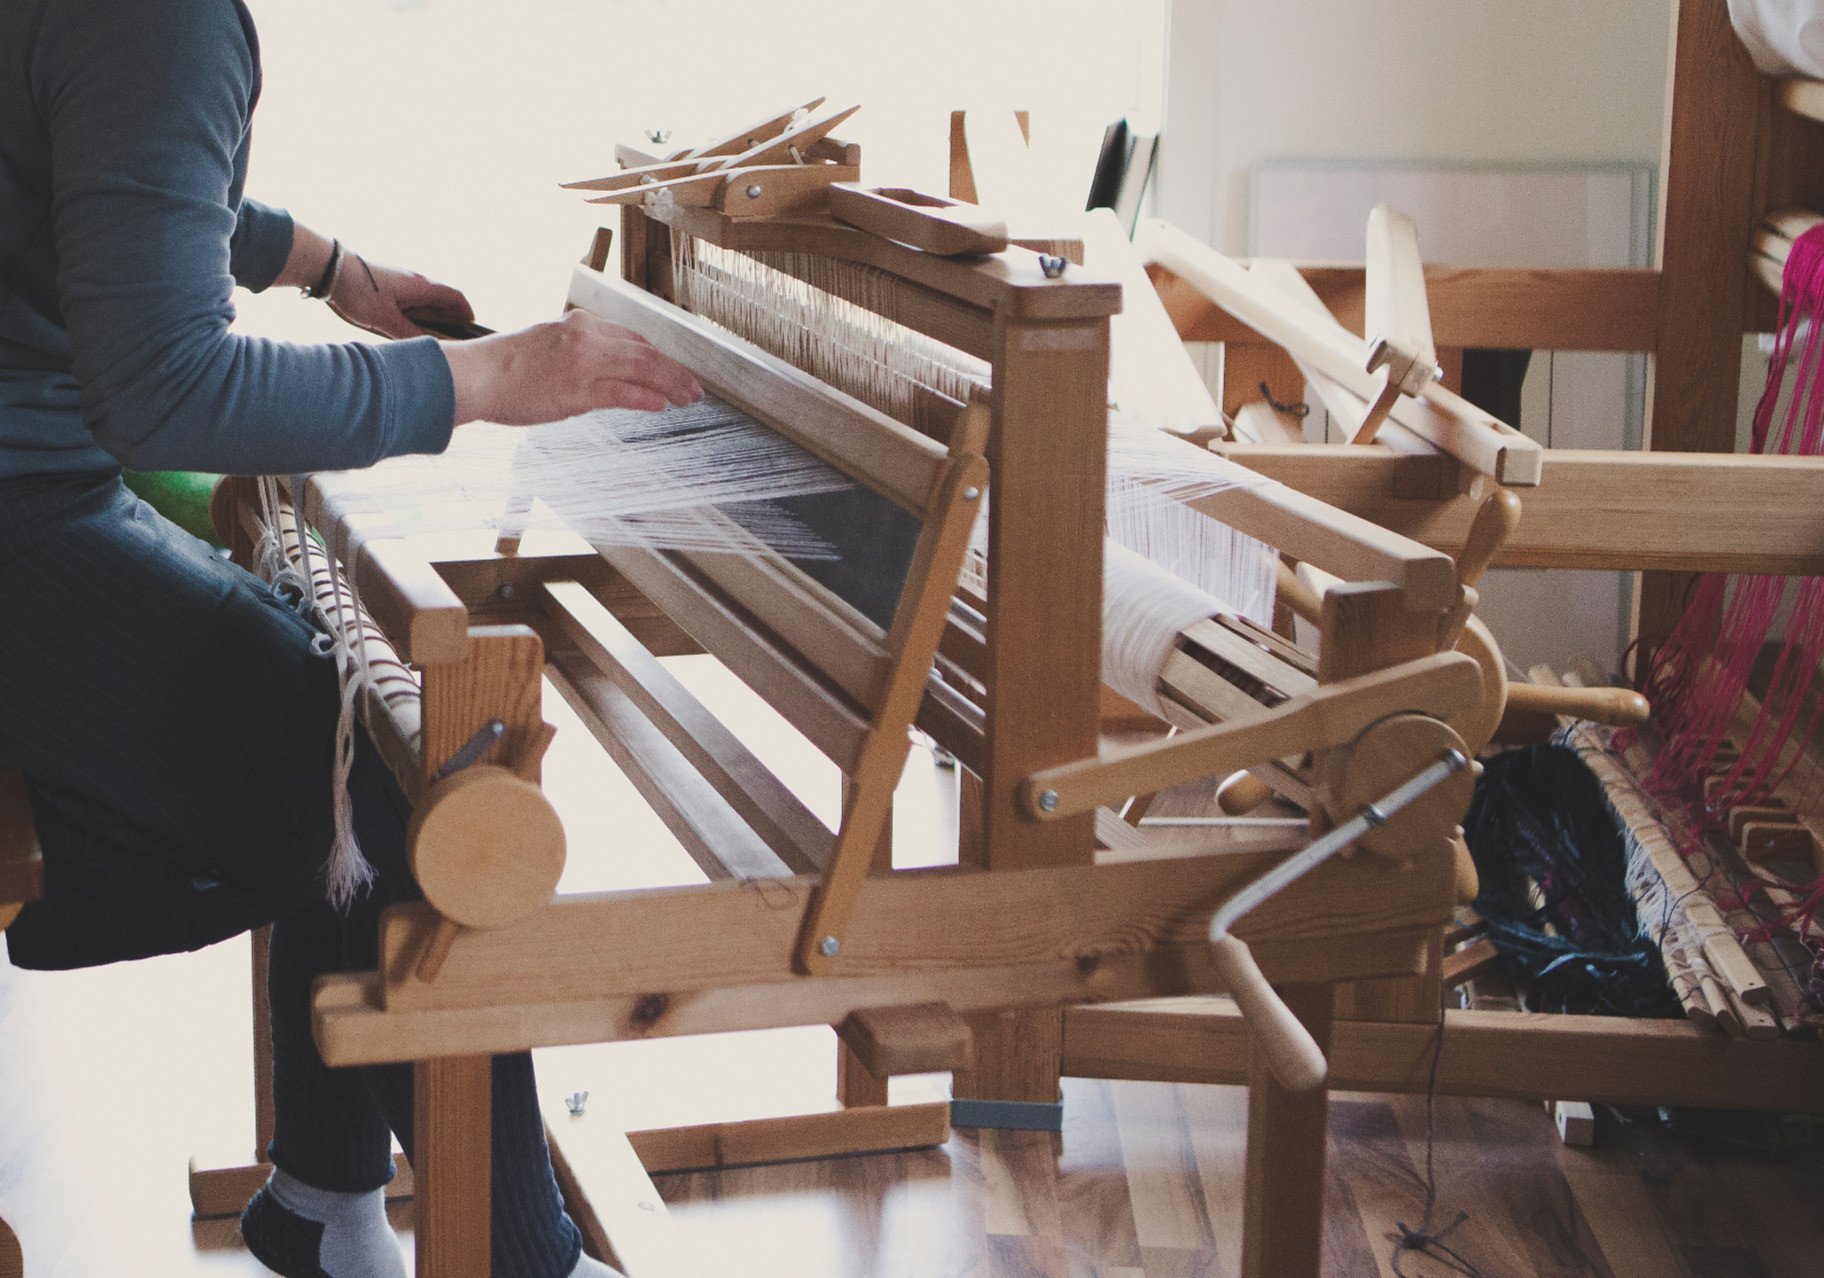 Weaving class 1:1